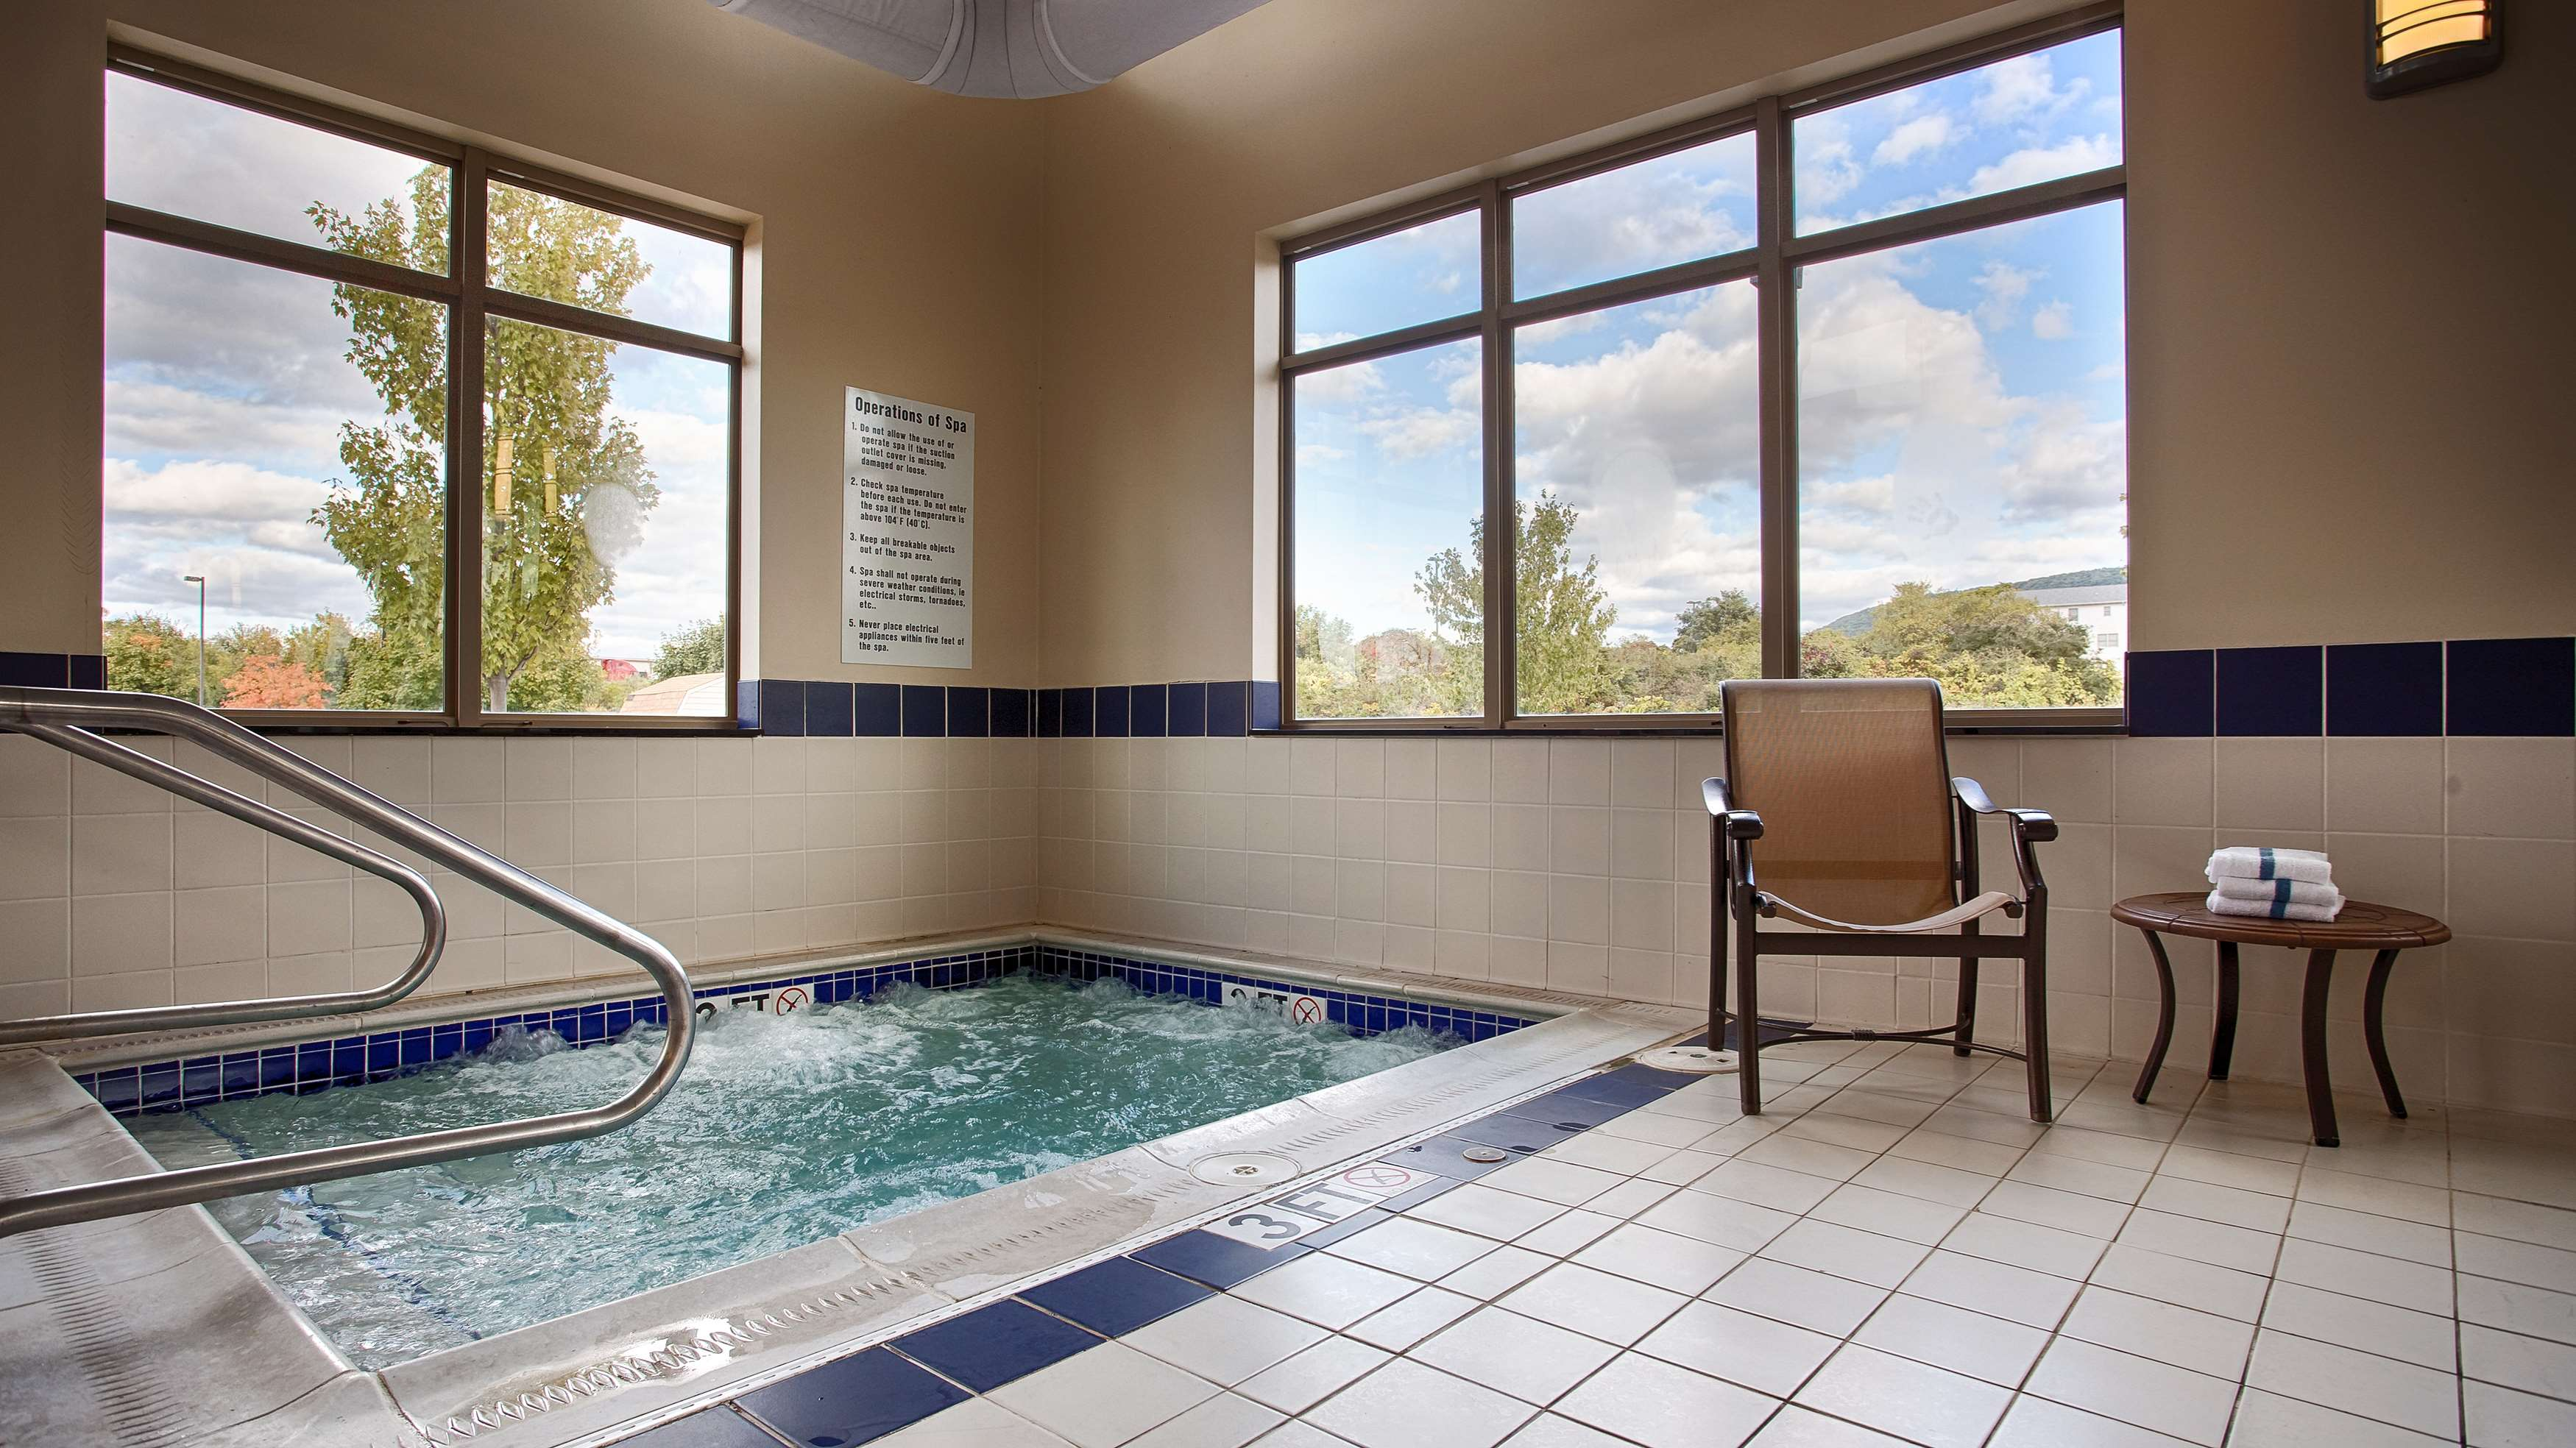 Best Western Plus University Park Inn & Suites image 16